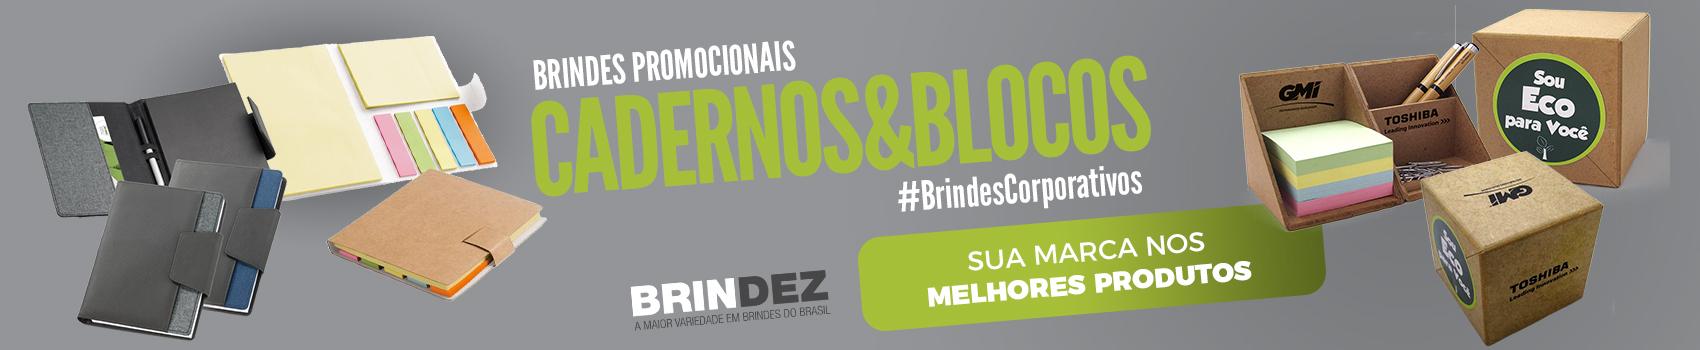 Brindez - Brindes Promocionais